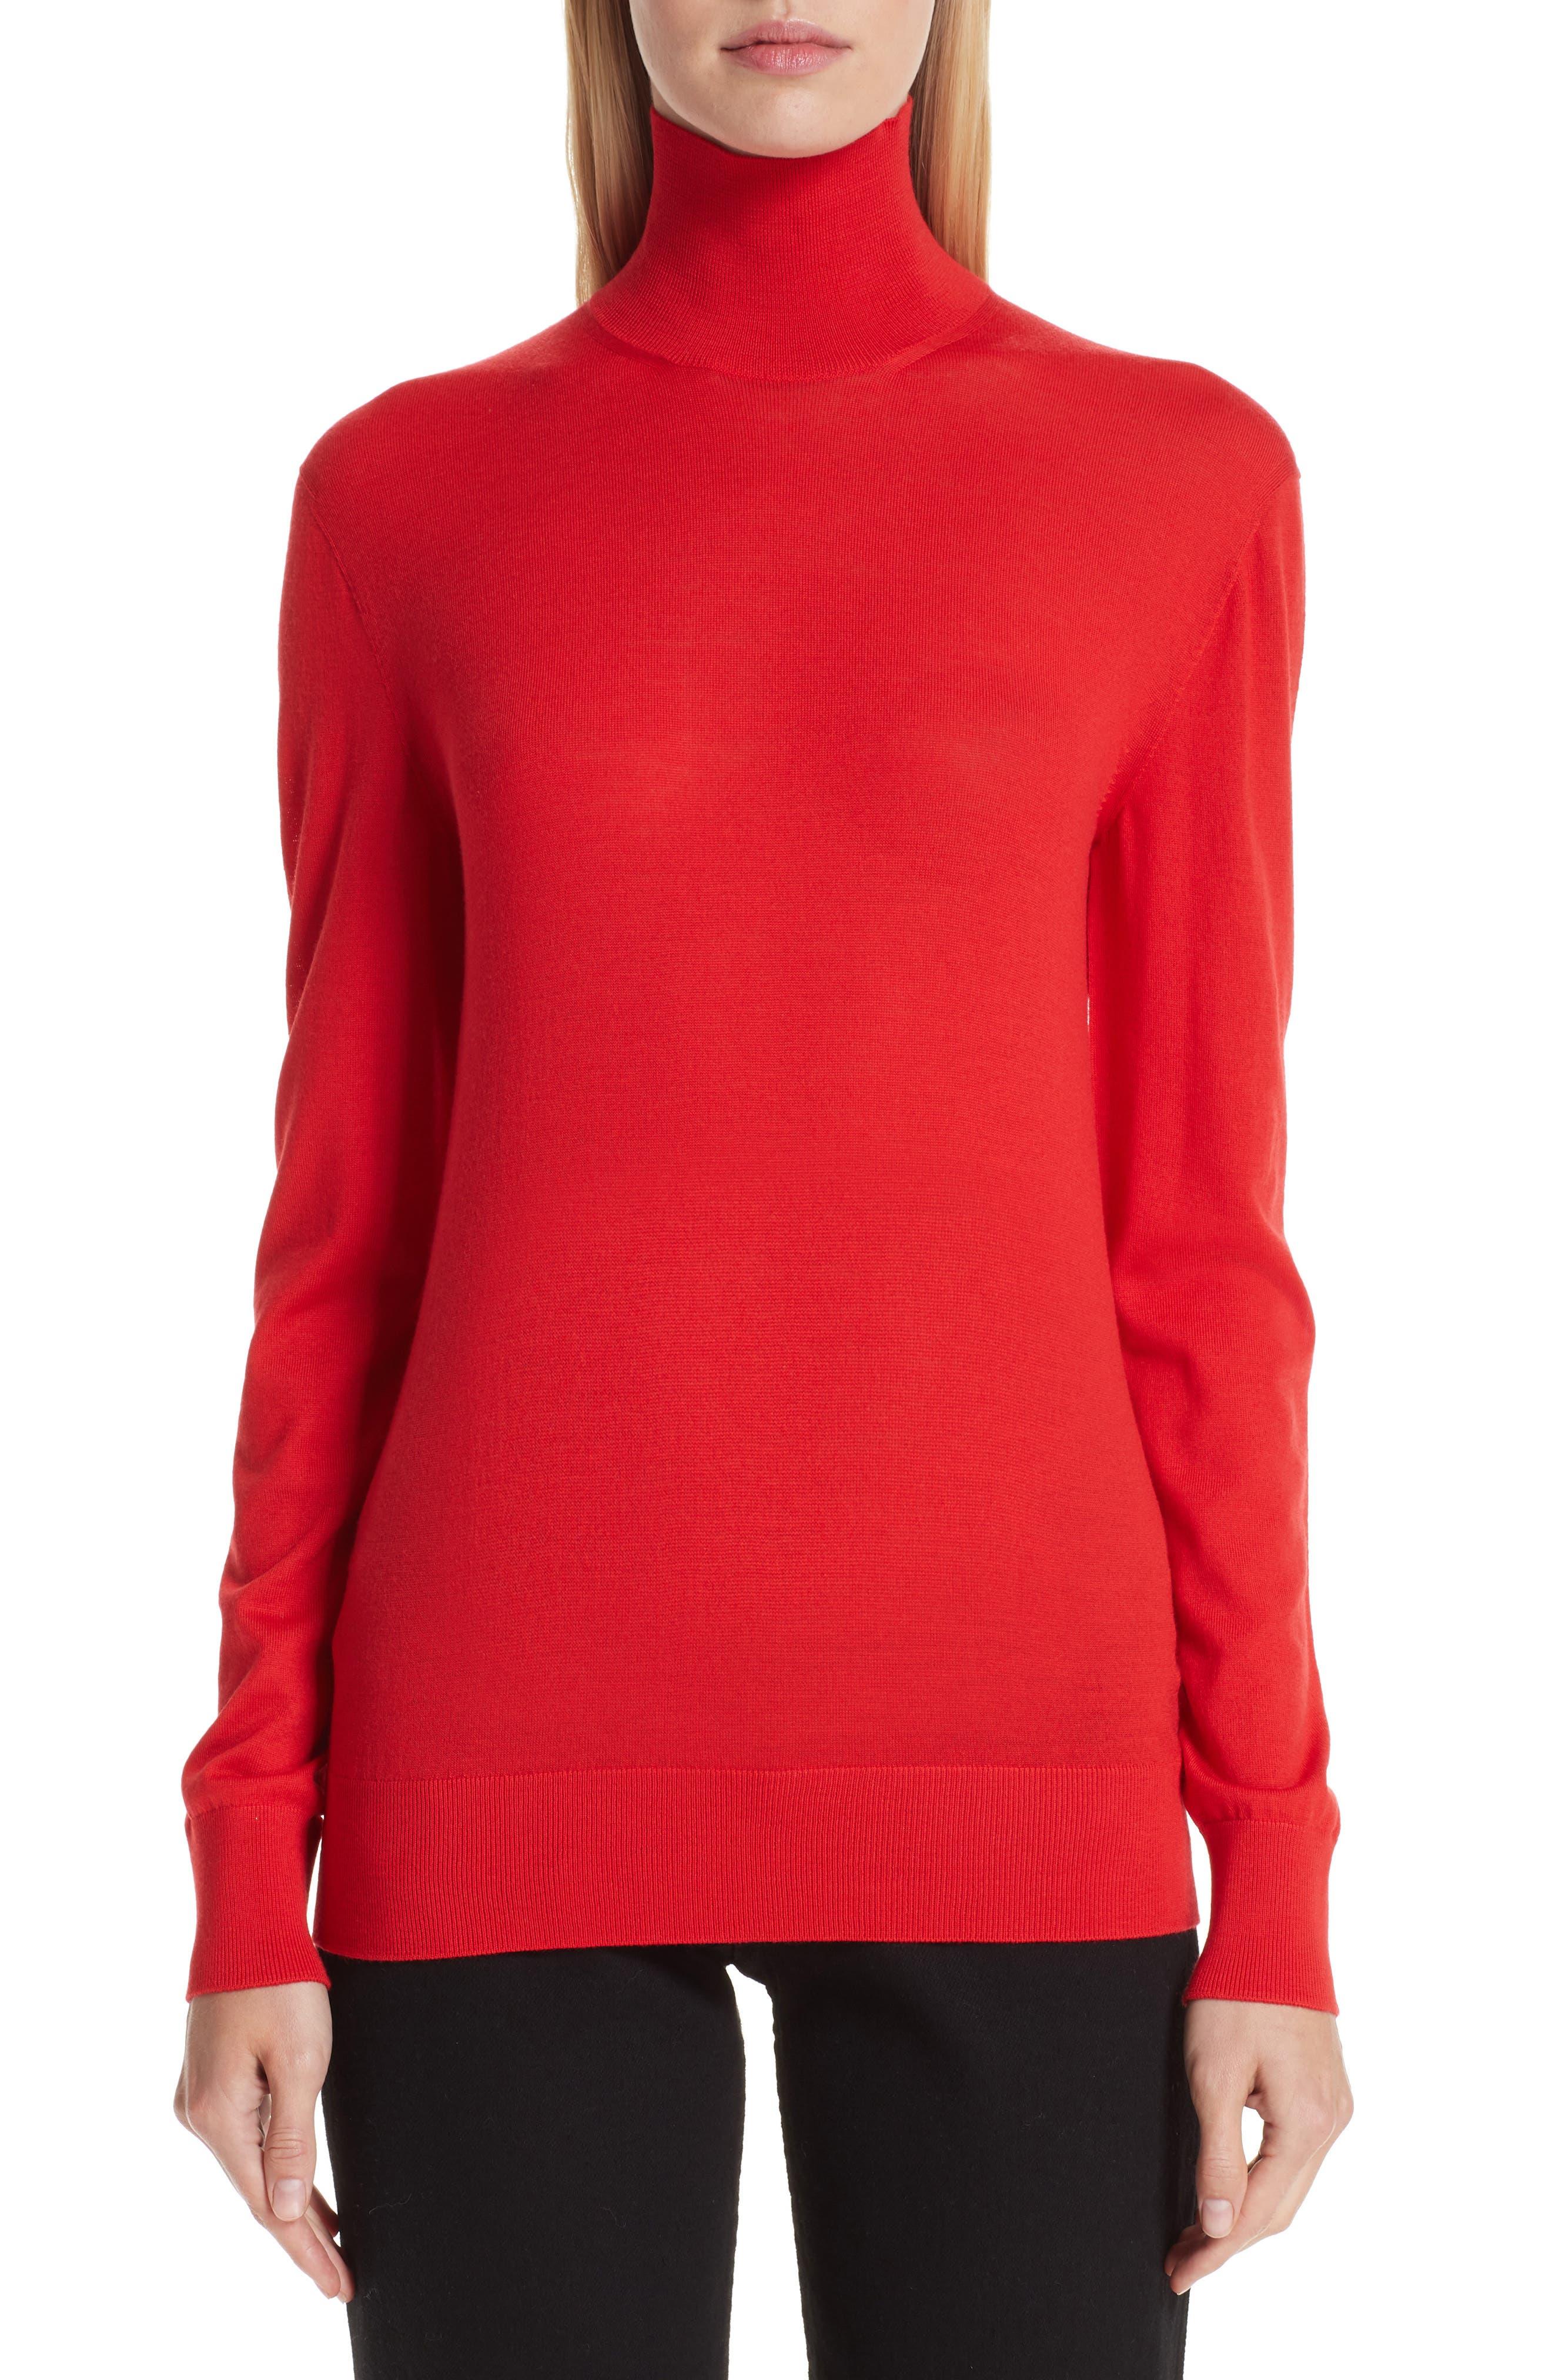 Kwaidan Editions Merino Wool Turtleneck Sweater, 8 FR - Red